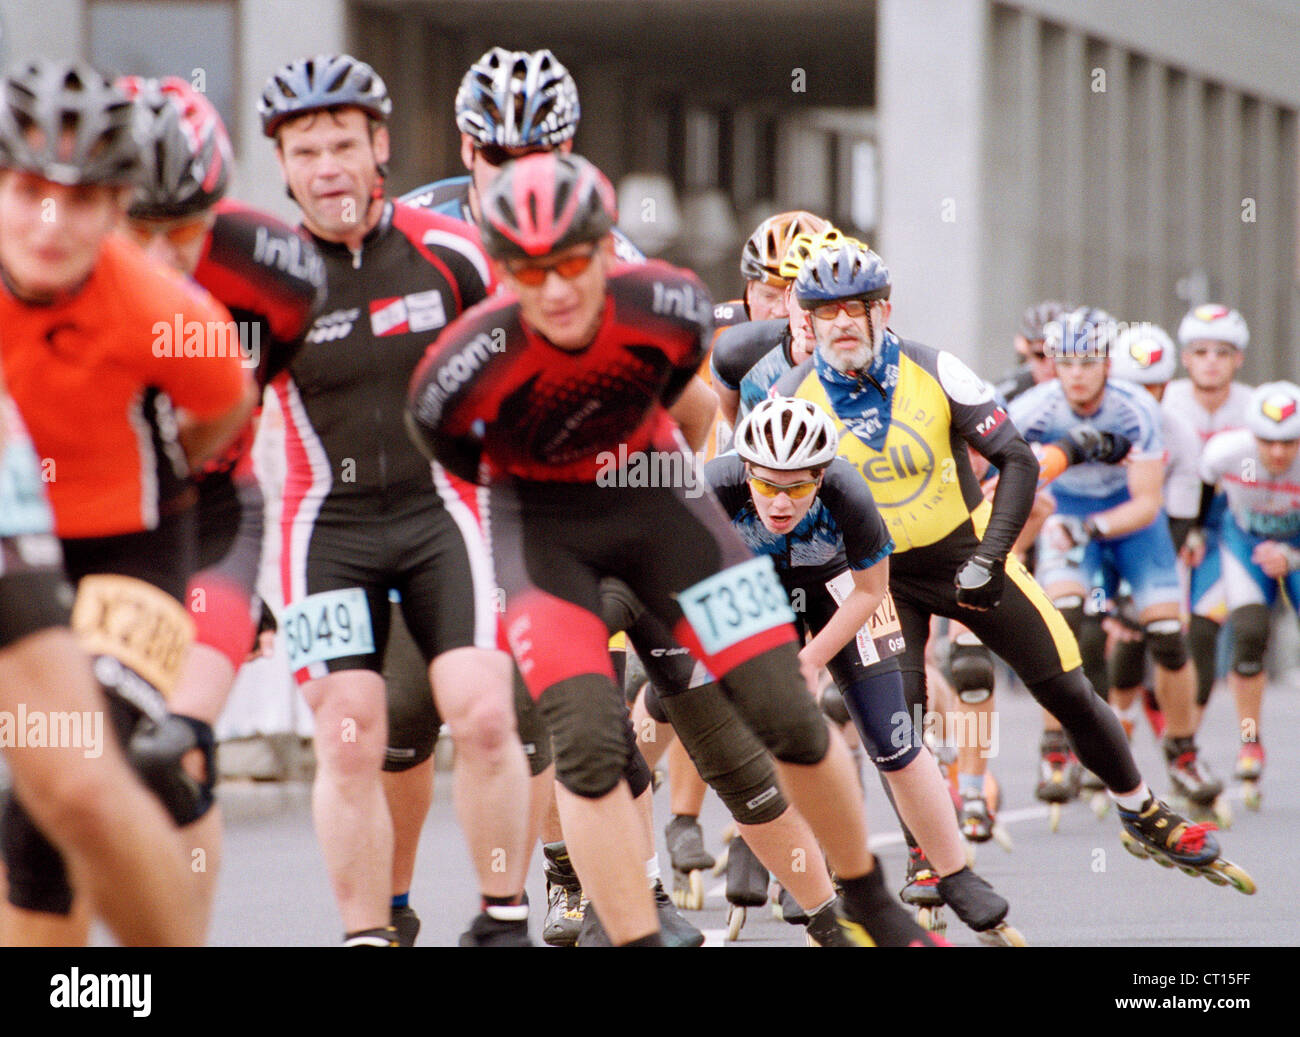 Skaters take part in the Berlin Marathon Stock Photo